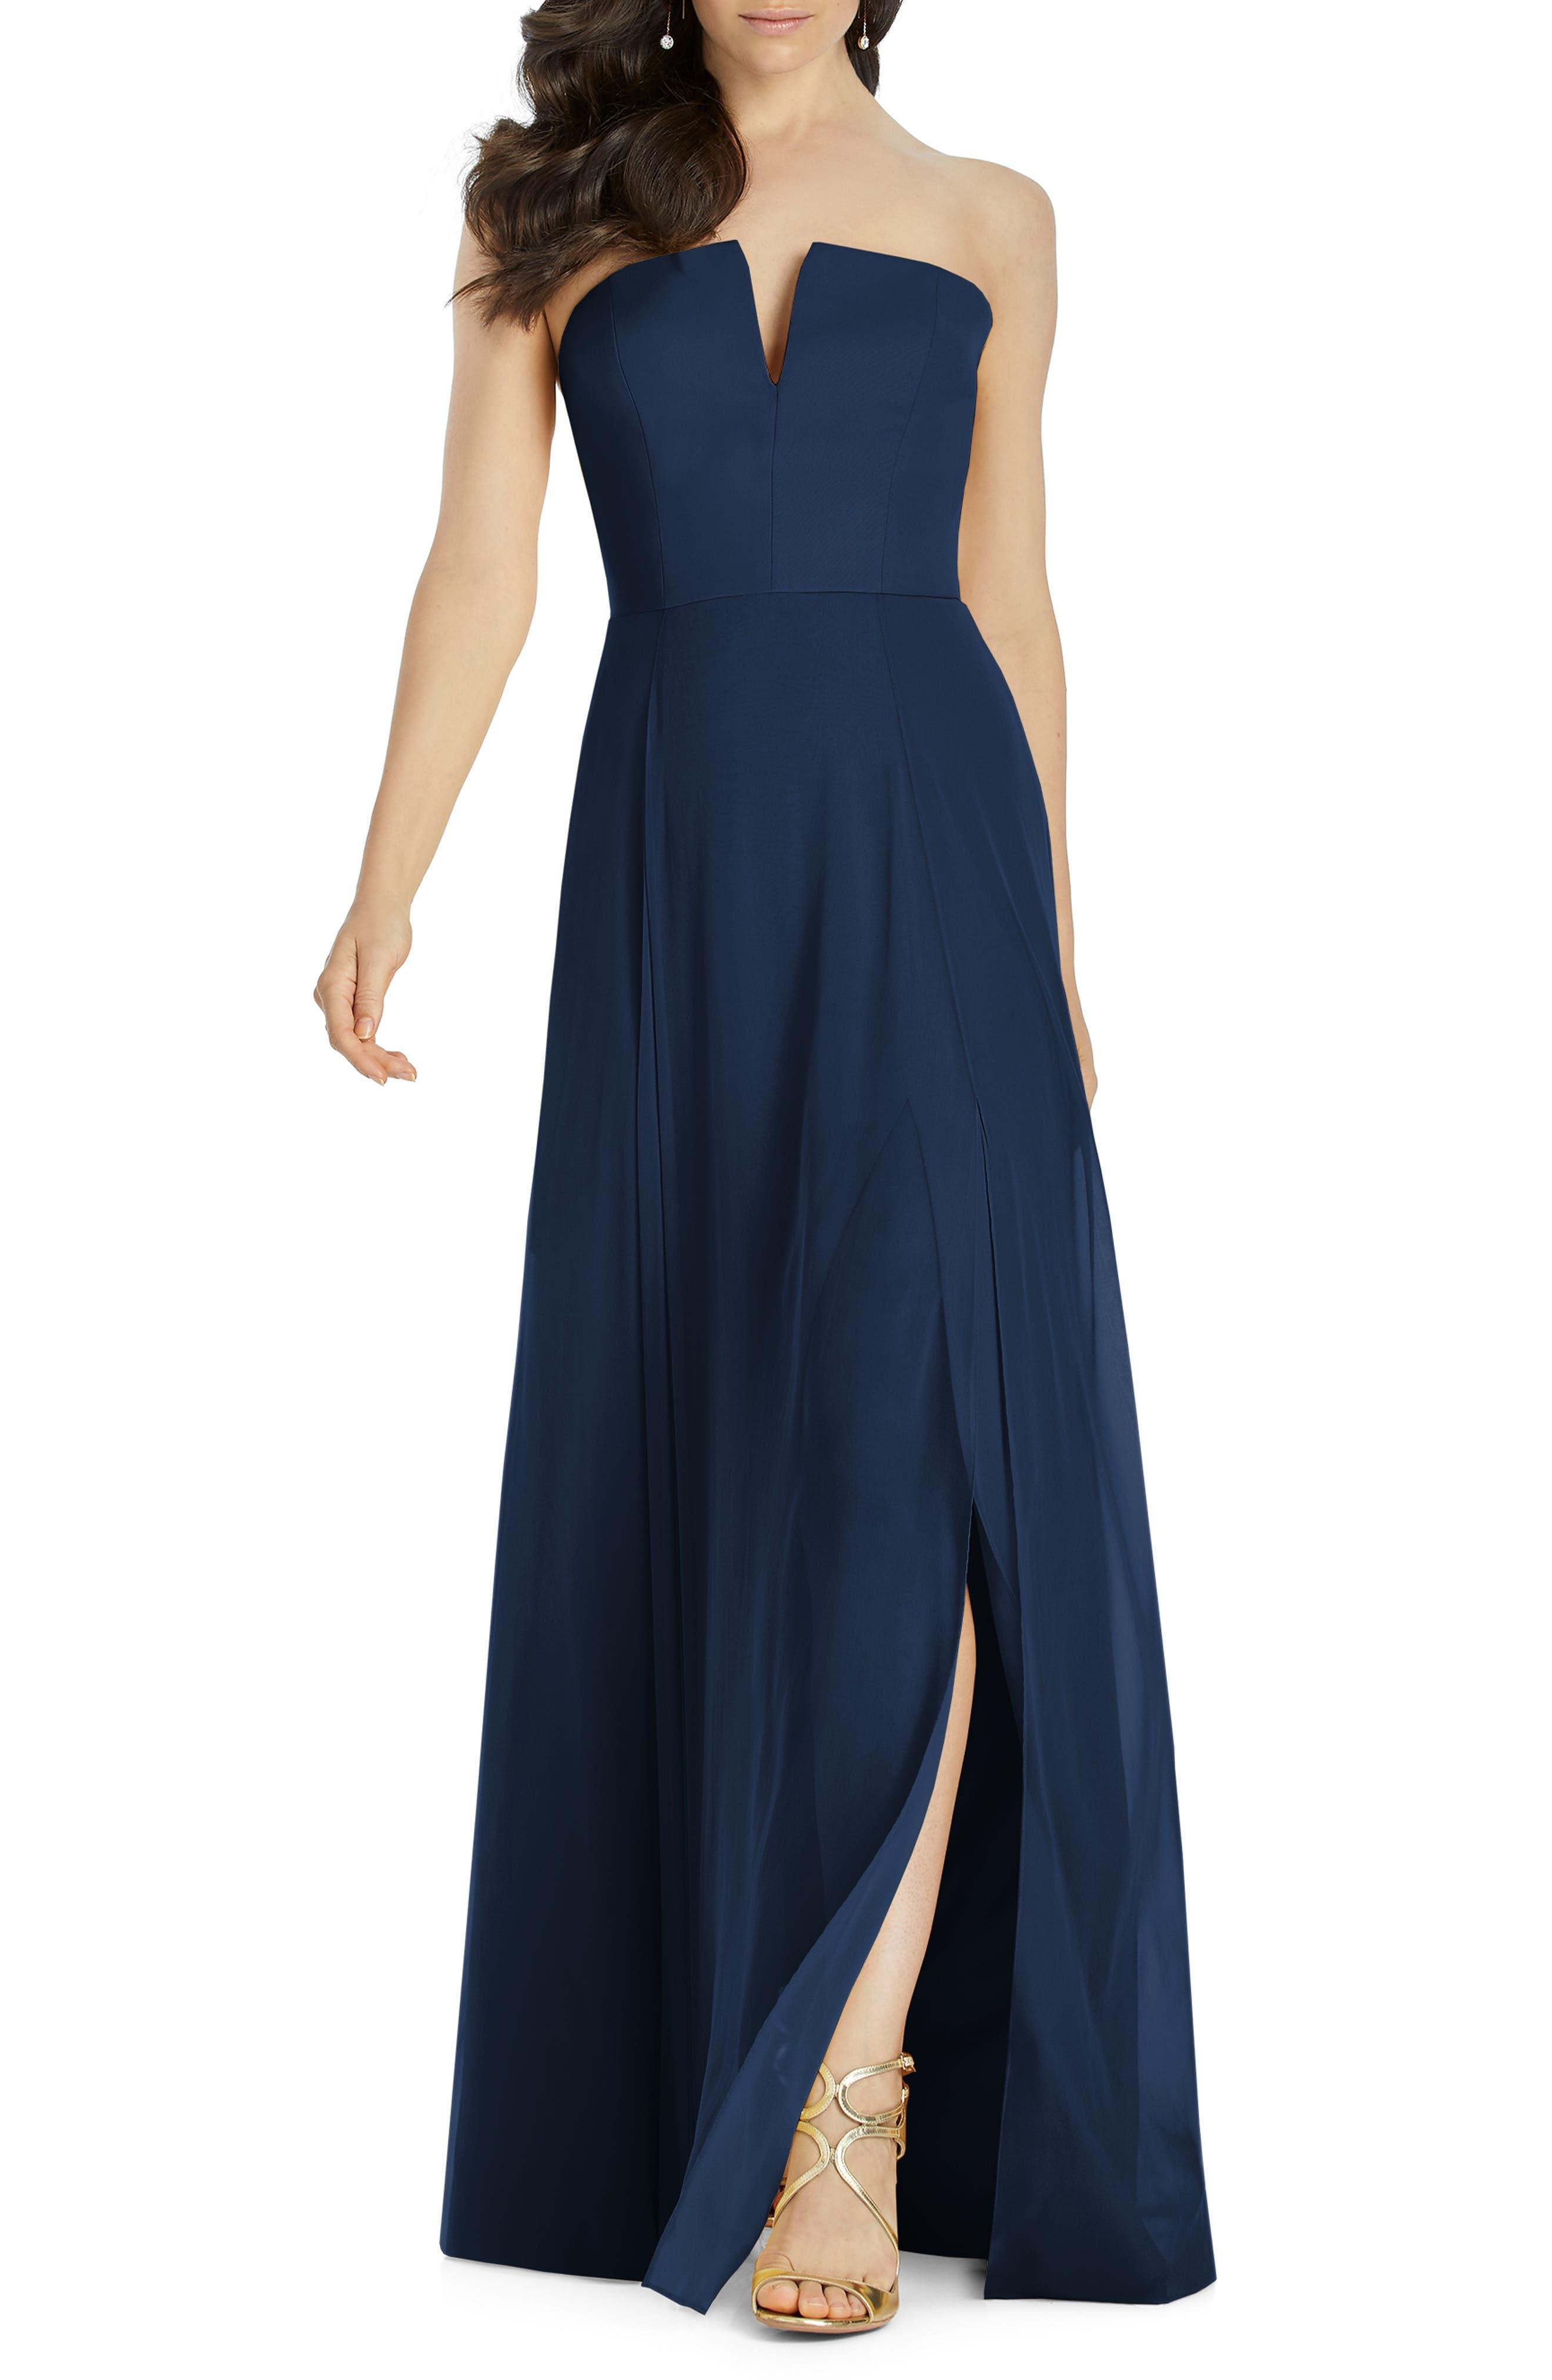 Dessy Collection Strapless Chiffon Evening Dress, Blue